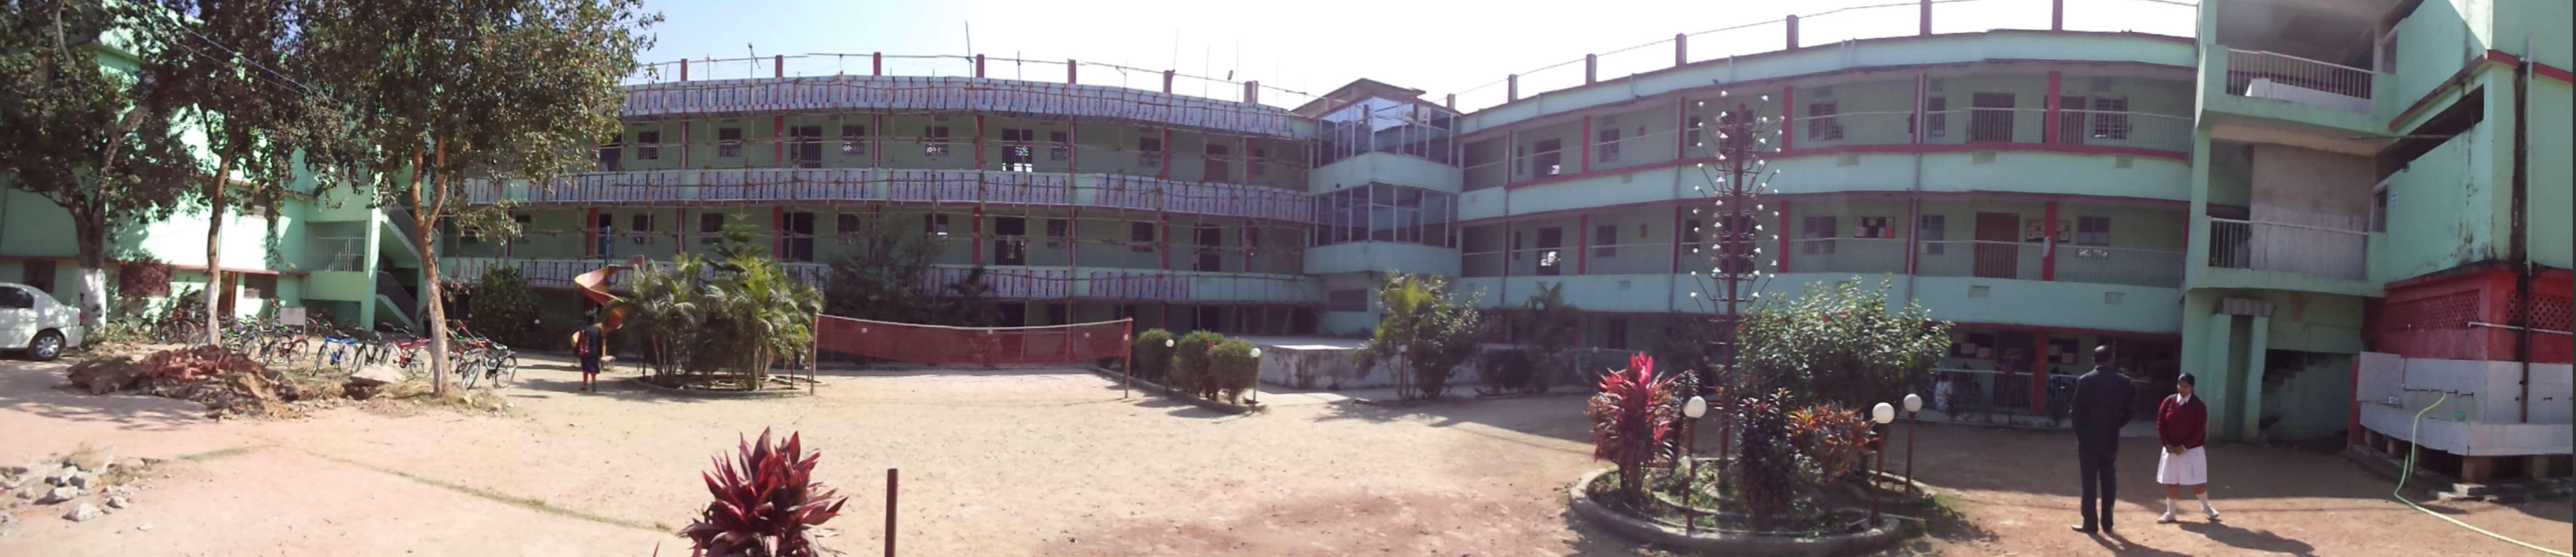 INTERNATIONAL PUBLIC SCHOOL KANKE ROAD RANCHI JHARKHAND 3430167